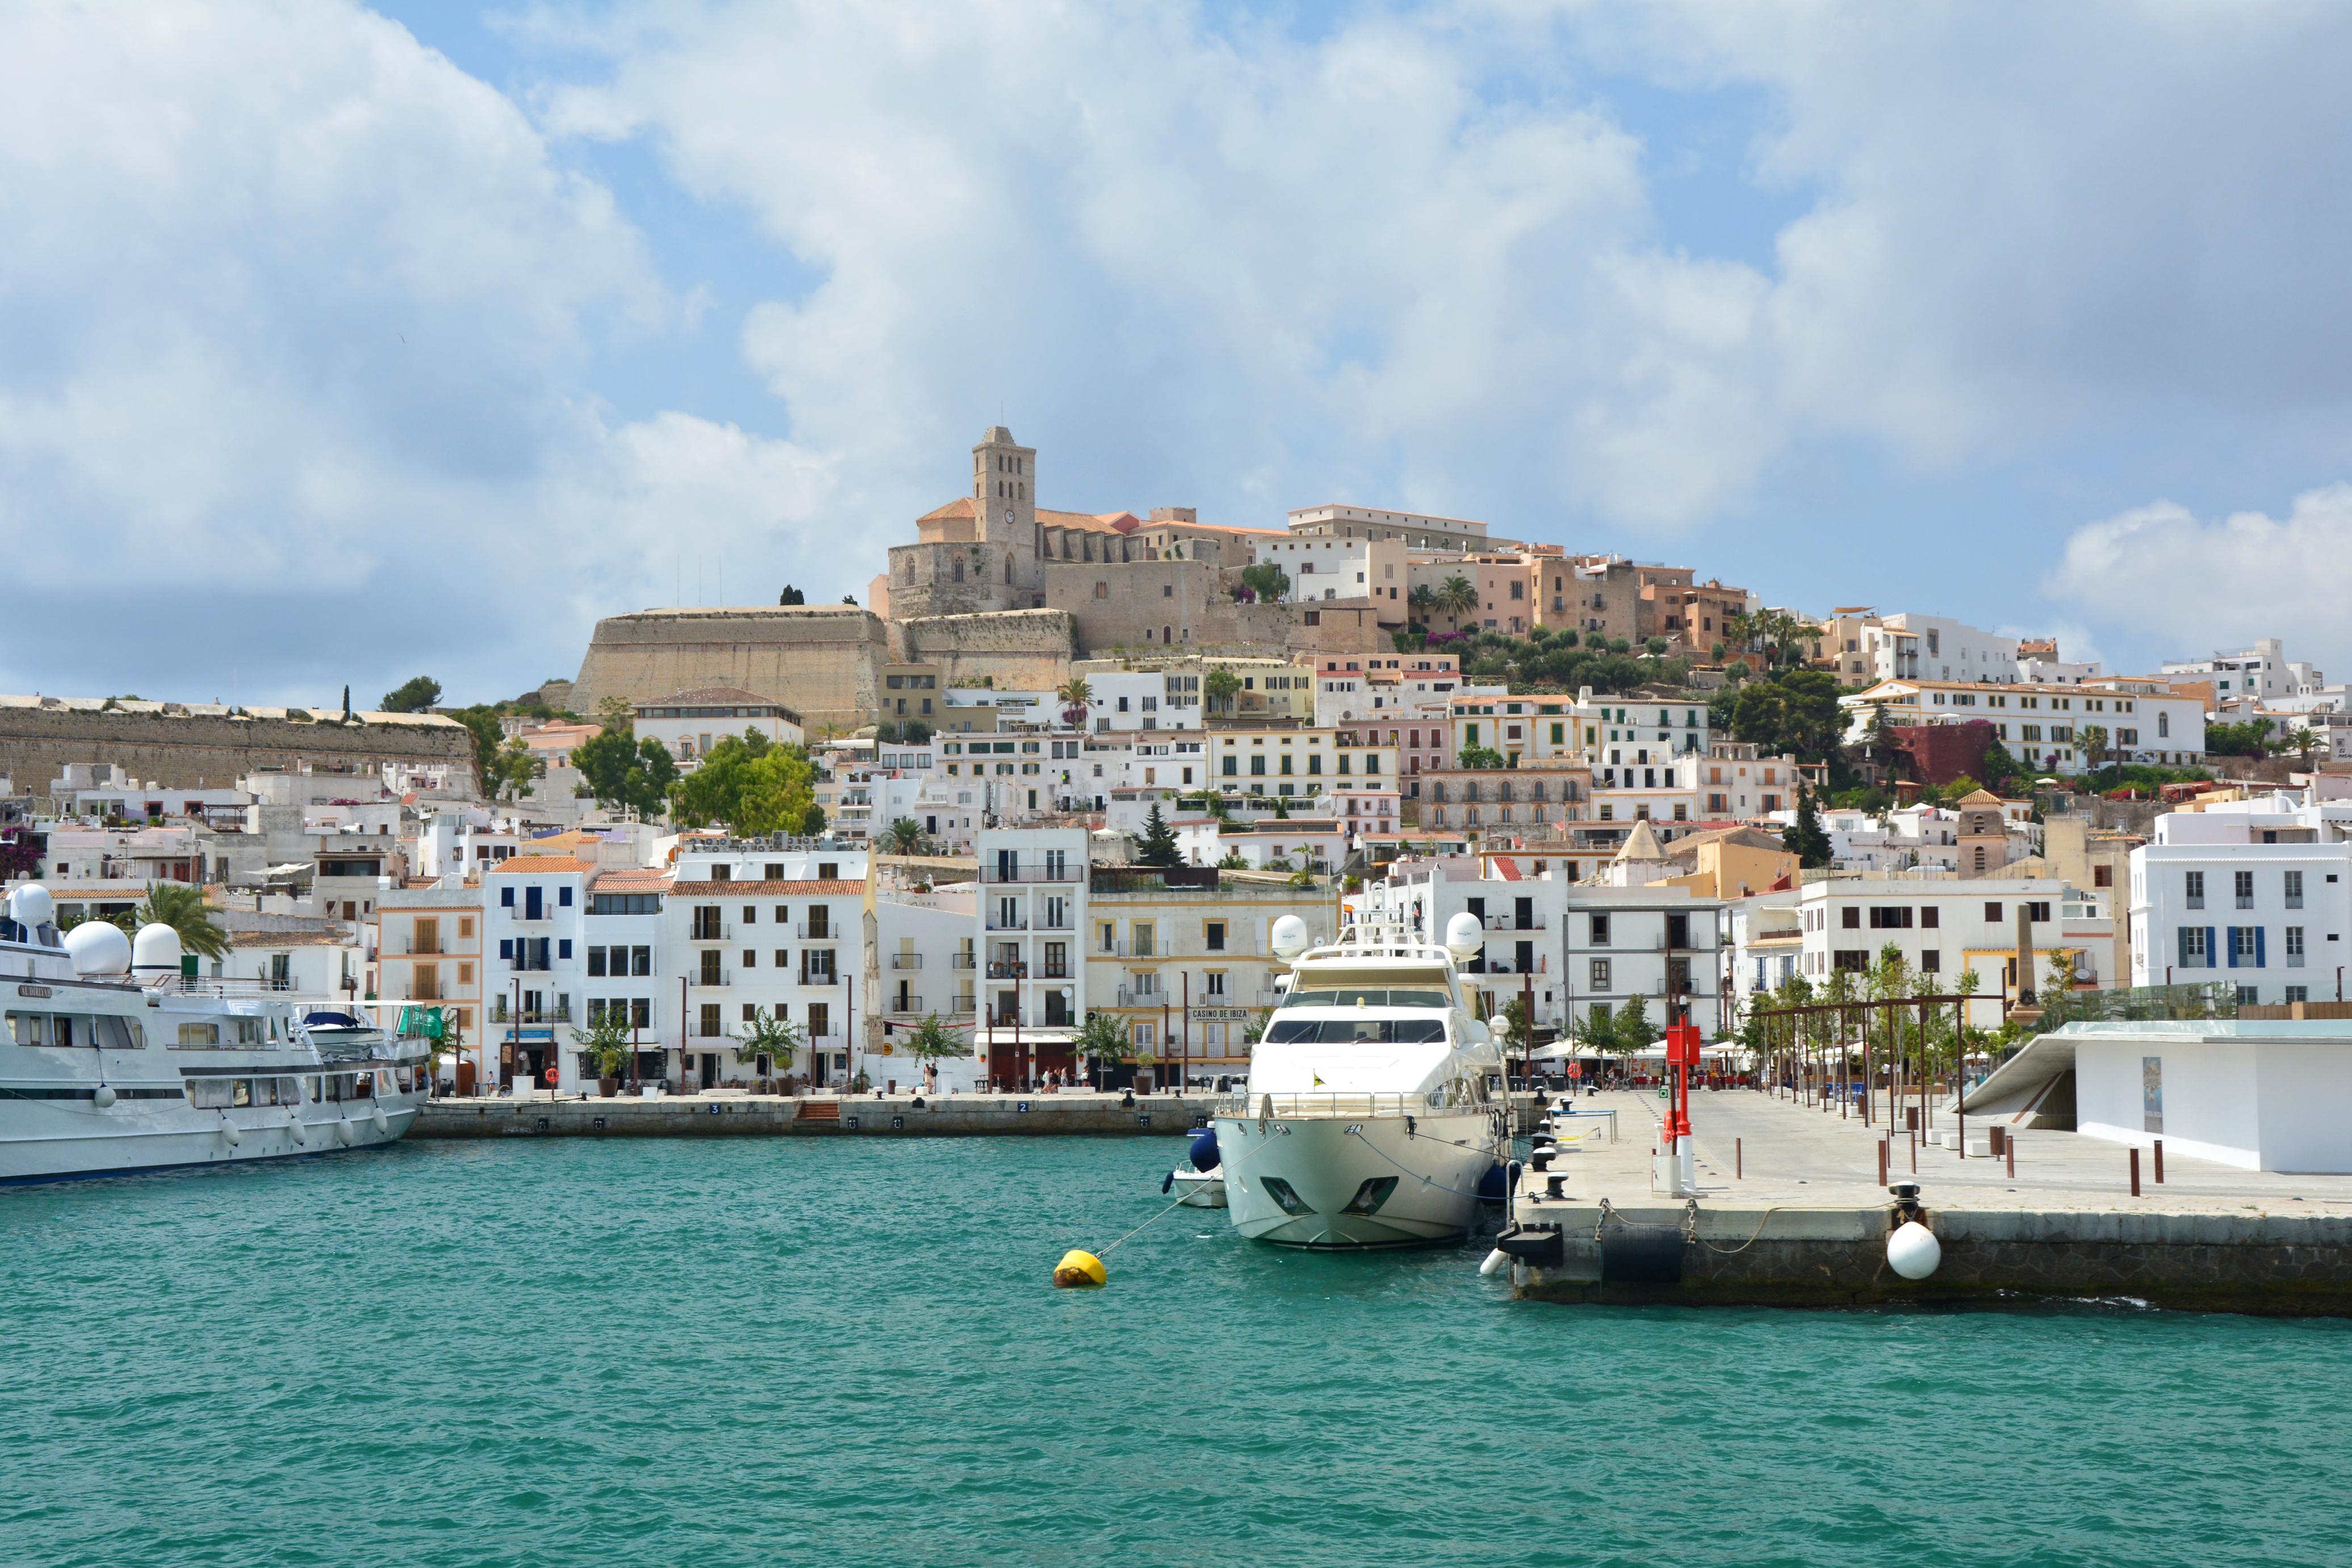 IBIZA, SPAIN - JULY 14, 2017 : Old town and marina of Eivissa city, Ibiza island. Waterfront view